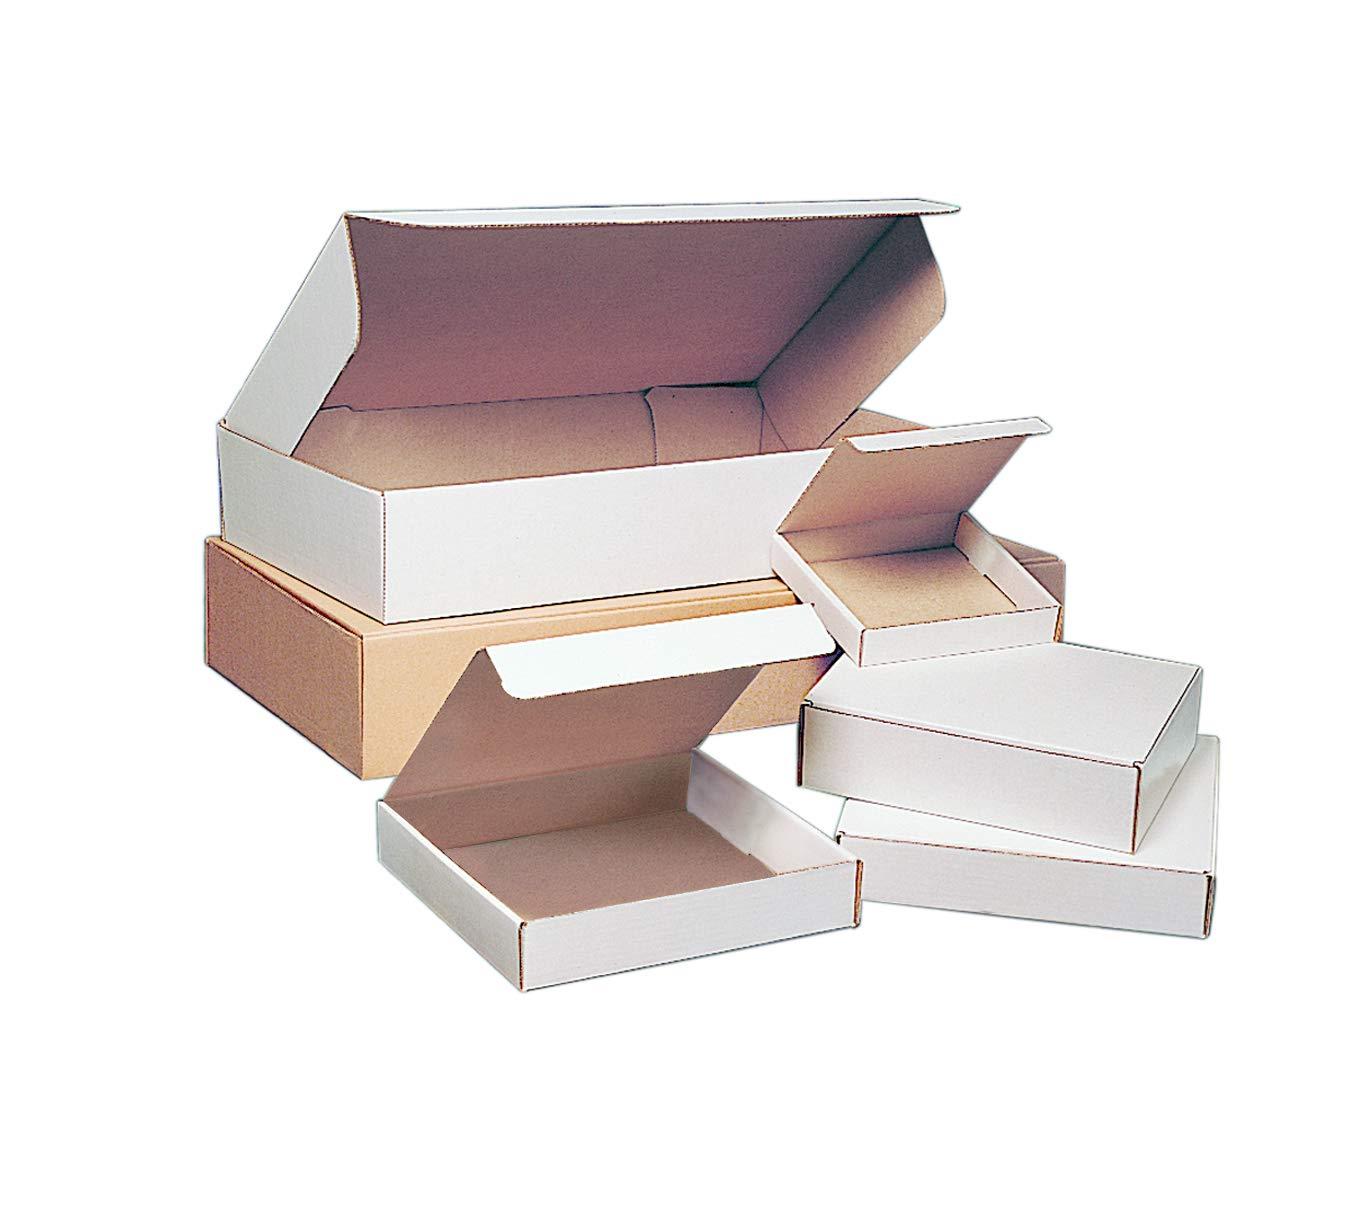 BOX USA BMFL19123K Deluxe Literature Mailers 19 x 12 x 3 19 x 12 x 3 Kraft Pack of 25